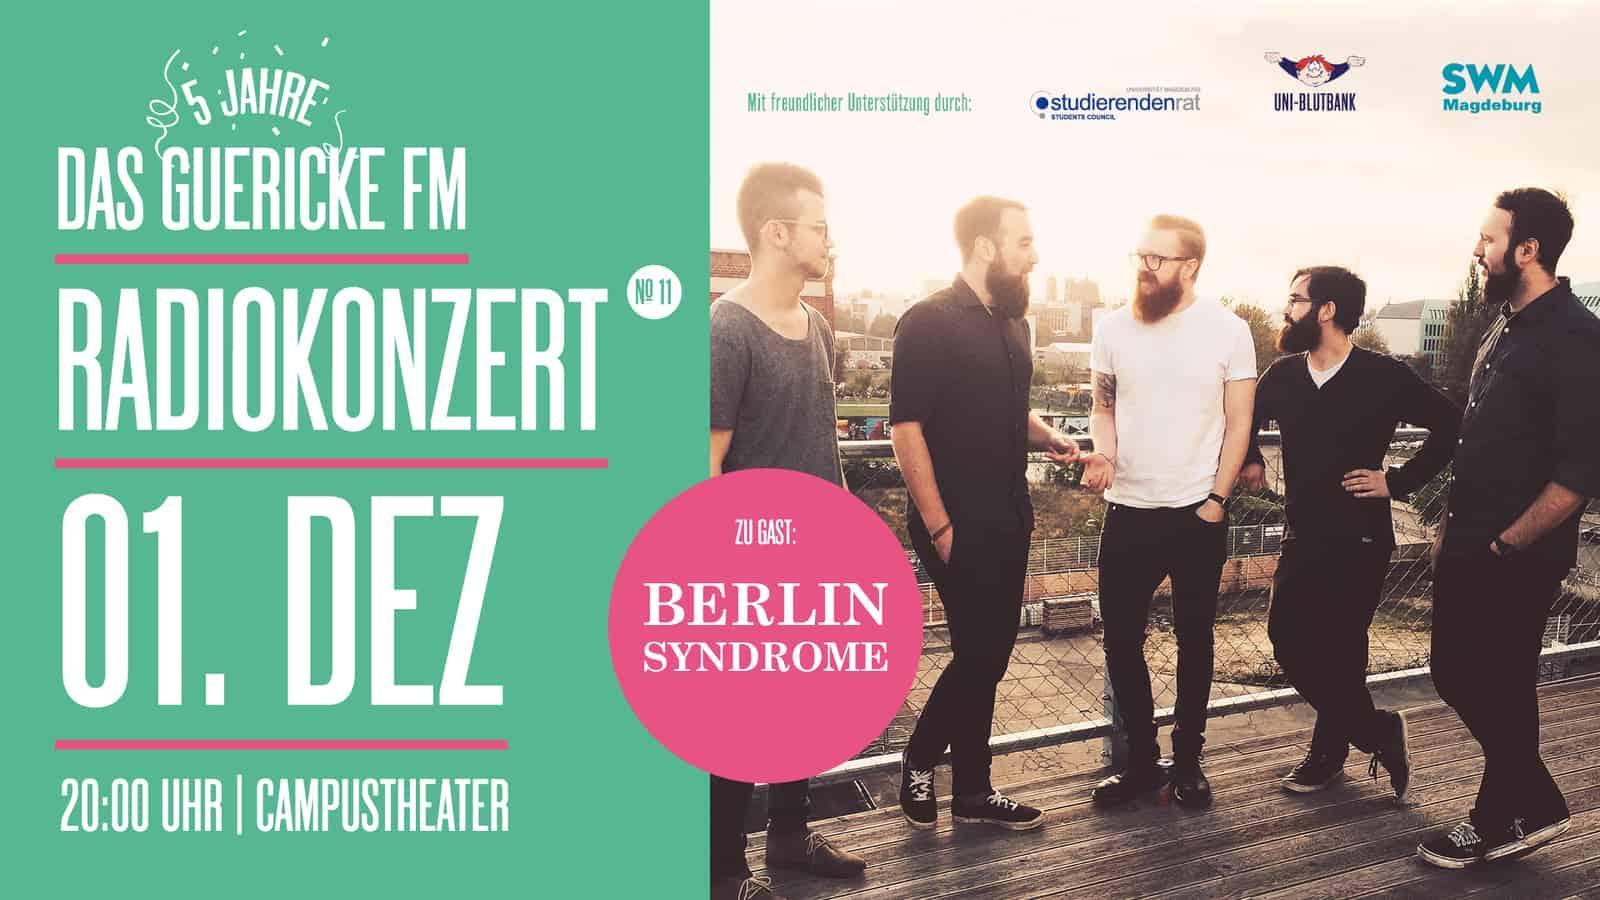 RADIOKONZERT Berlin Syndrom